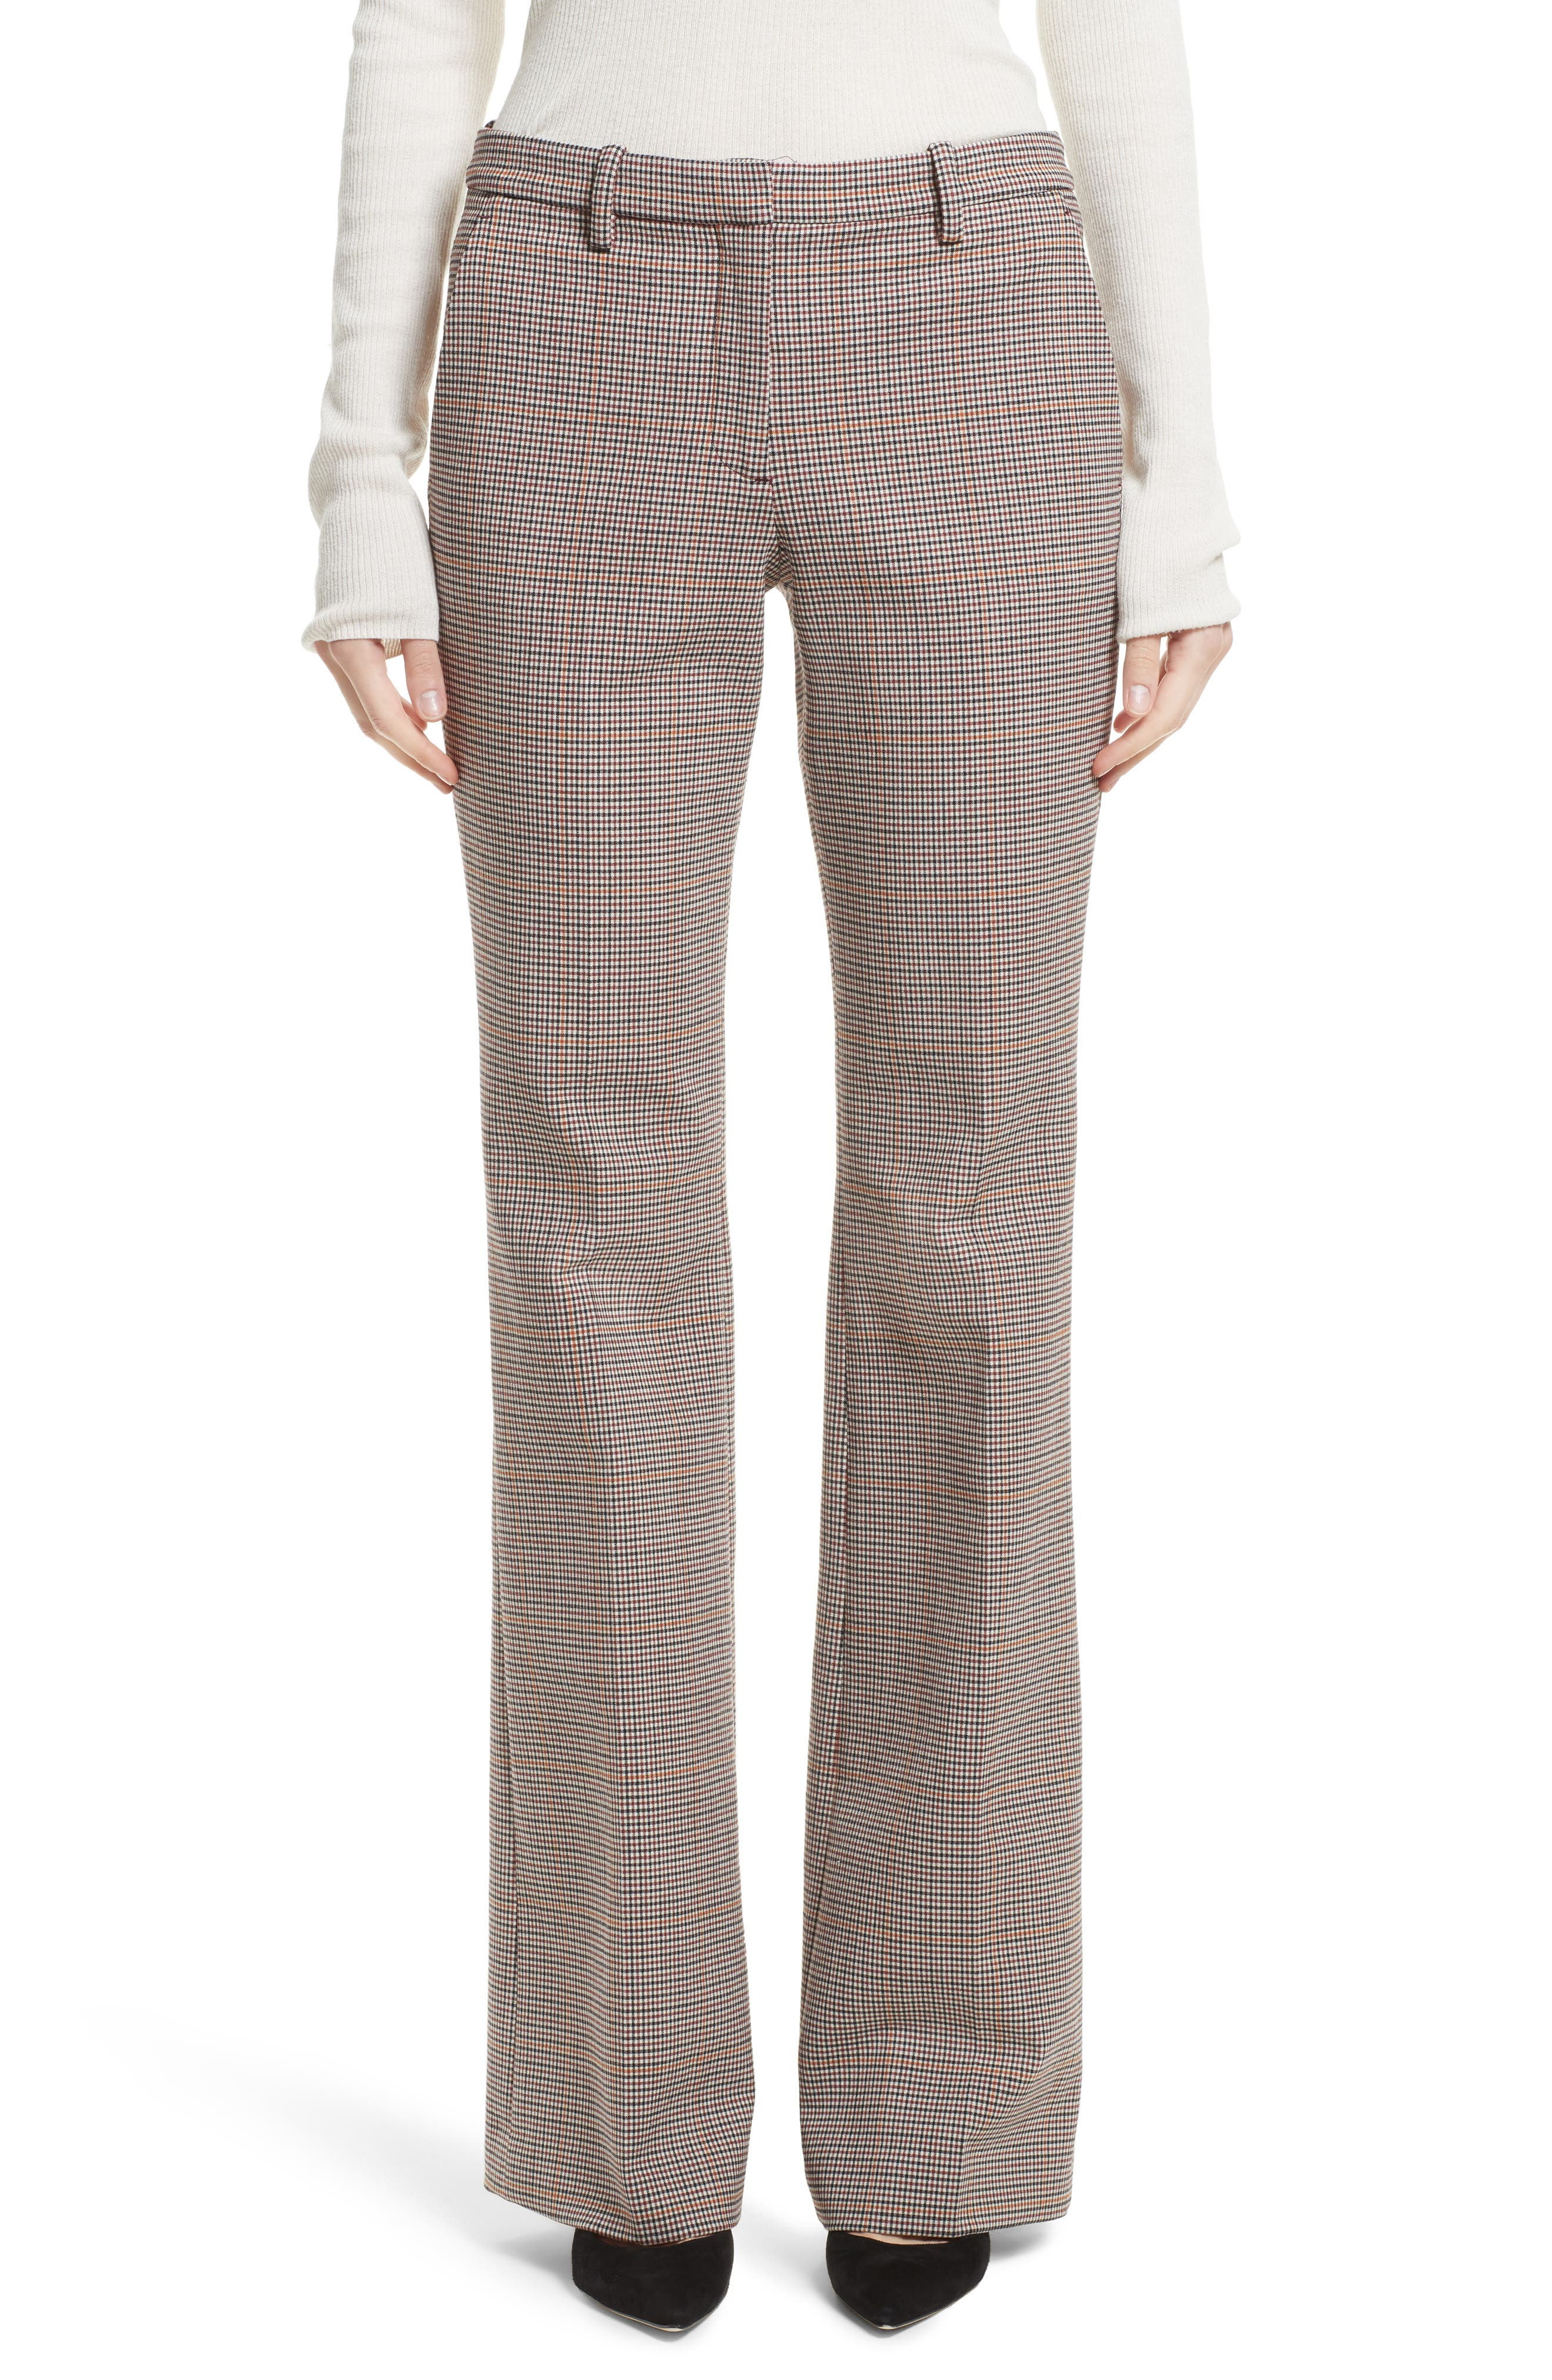 Demitria 2 Flare Leg Stretch Wool Pants,                         Main,                         color, Multi